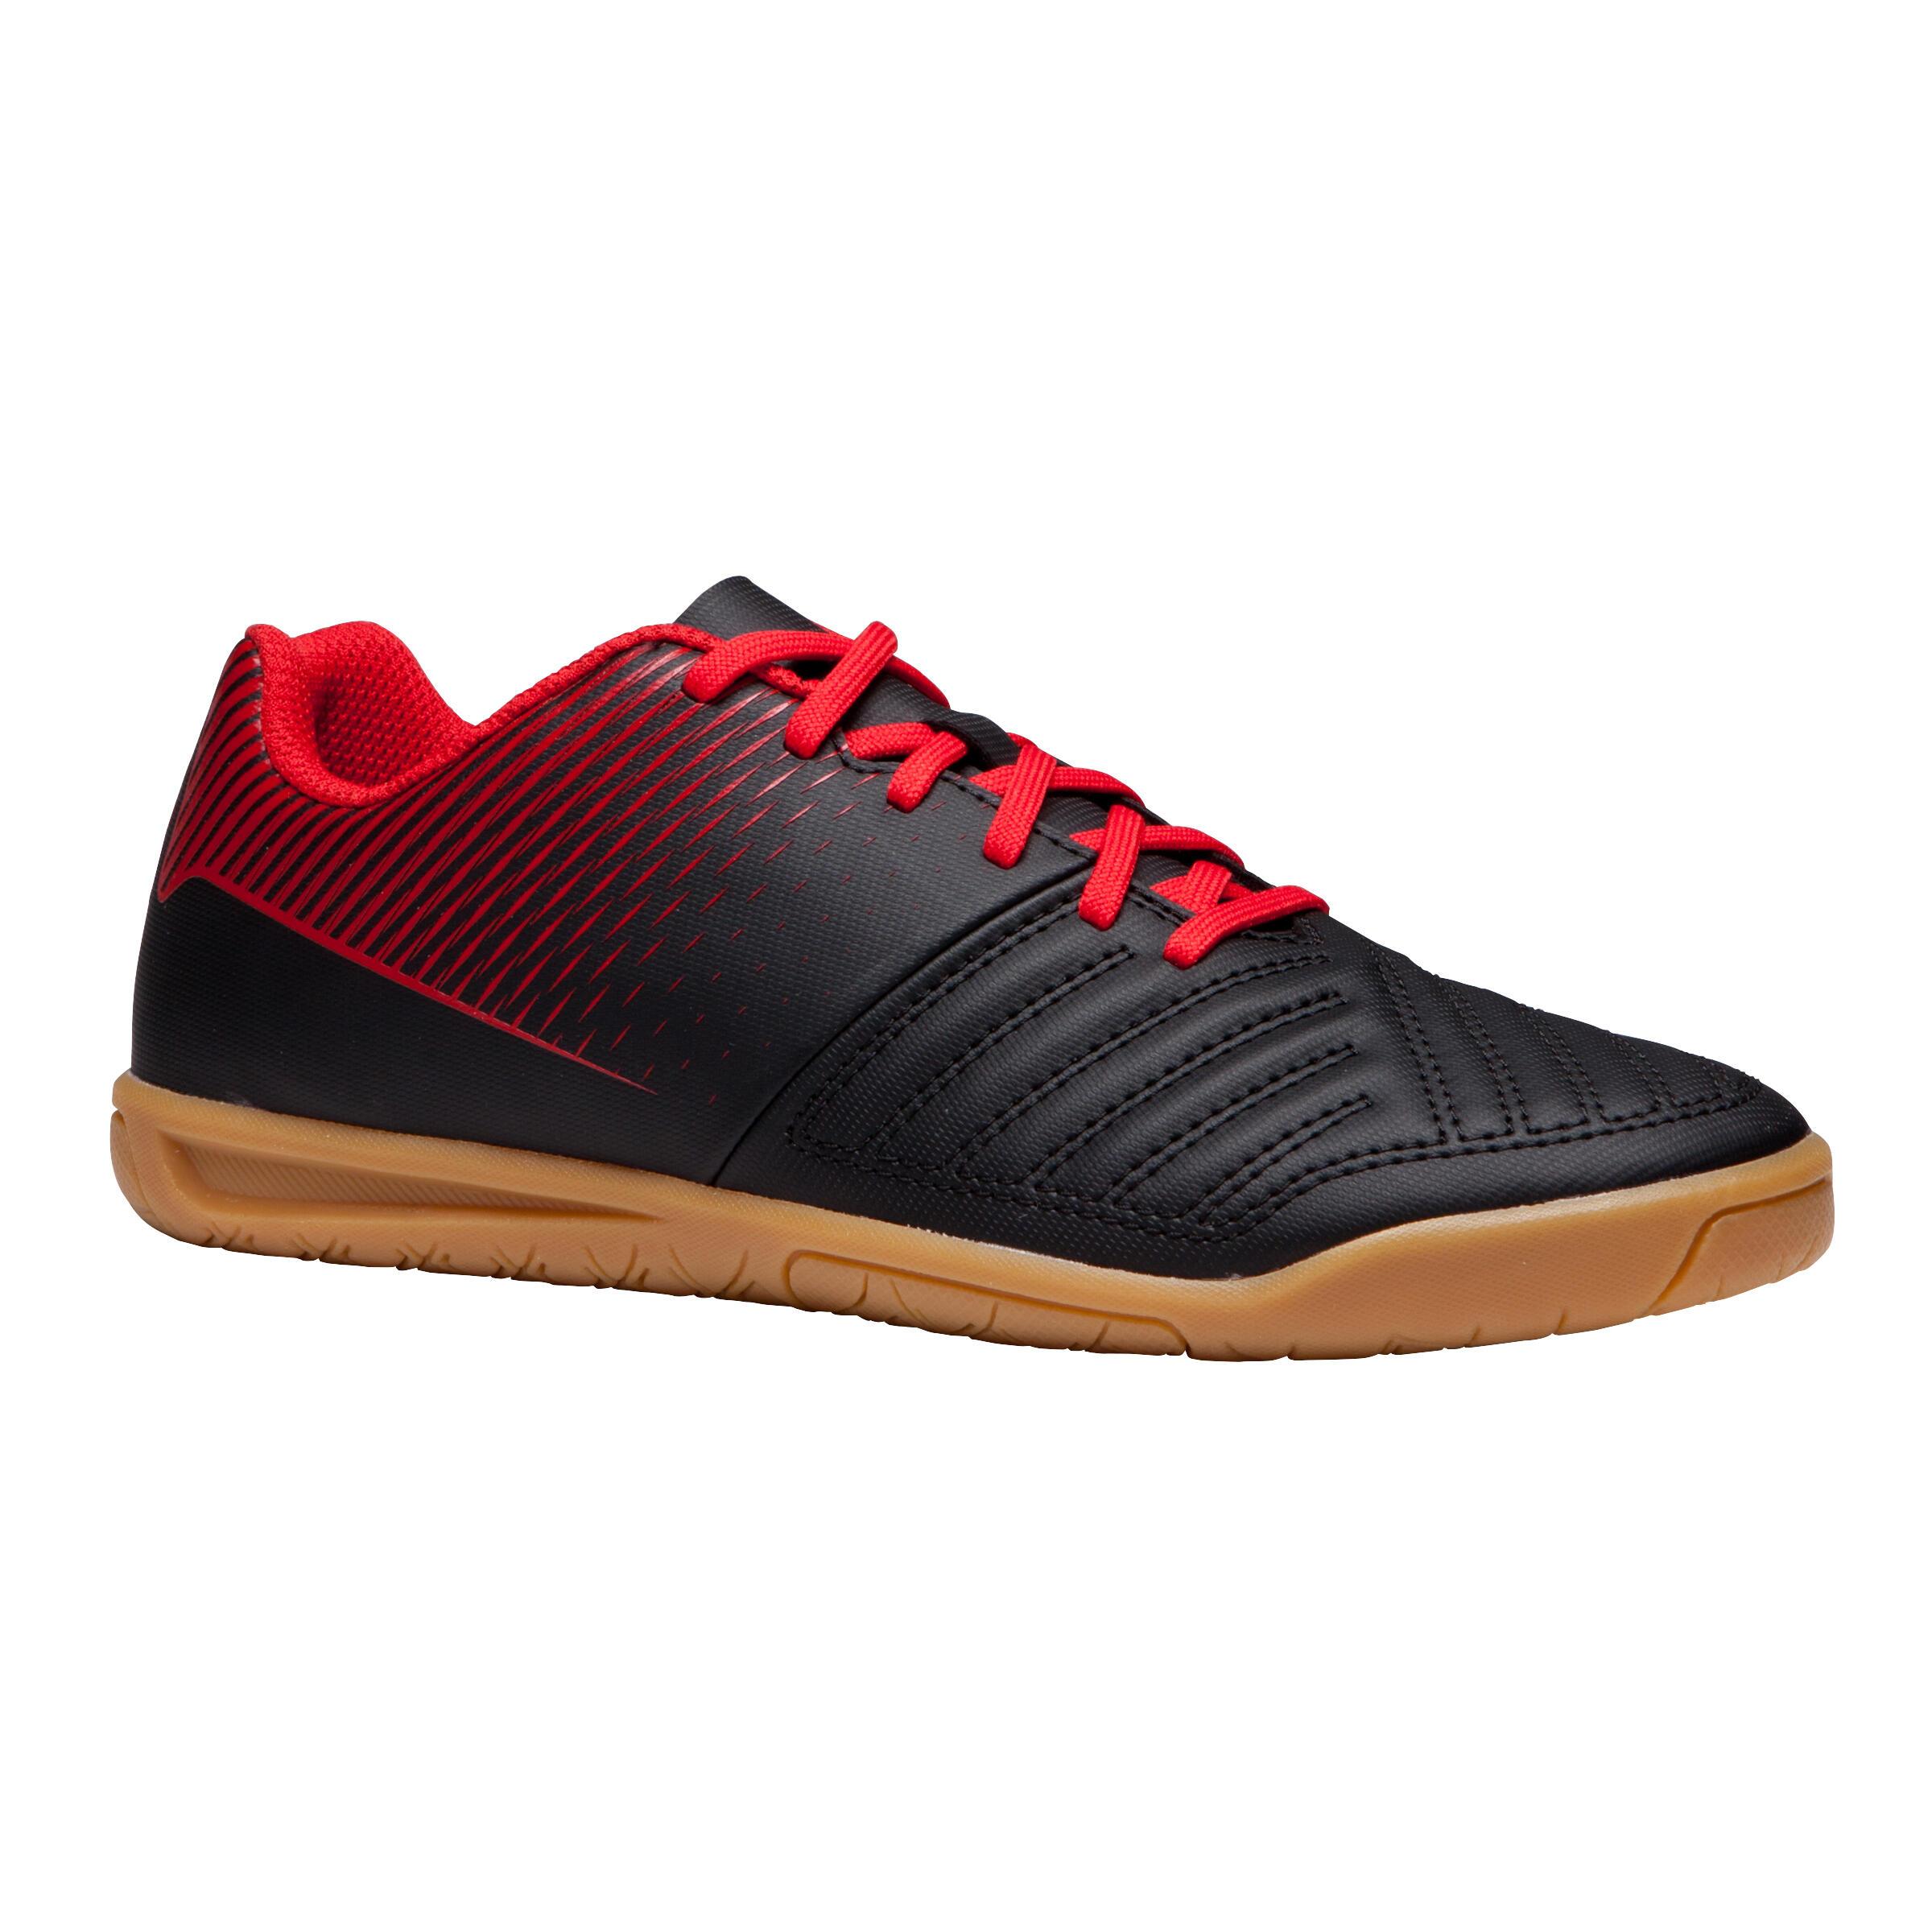 Kipsta Zaalvoetbalschoenen kind Agility 100 zwart/rood